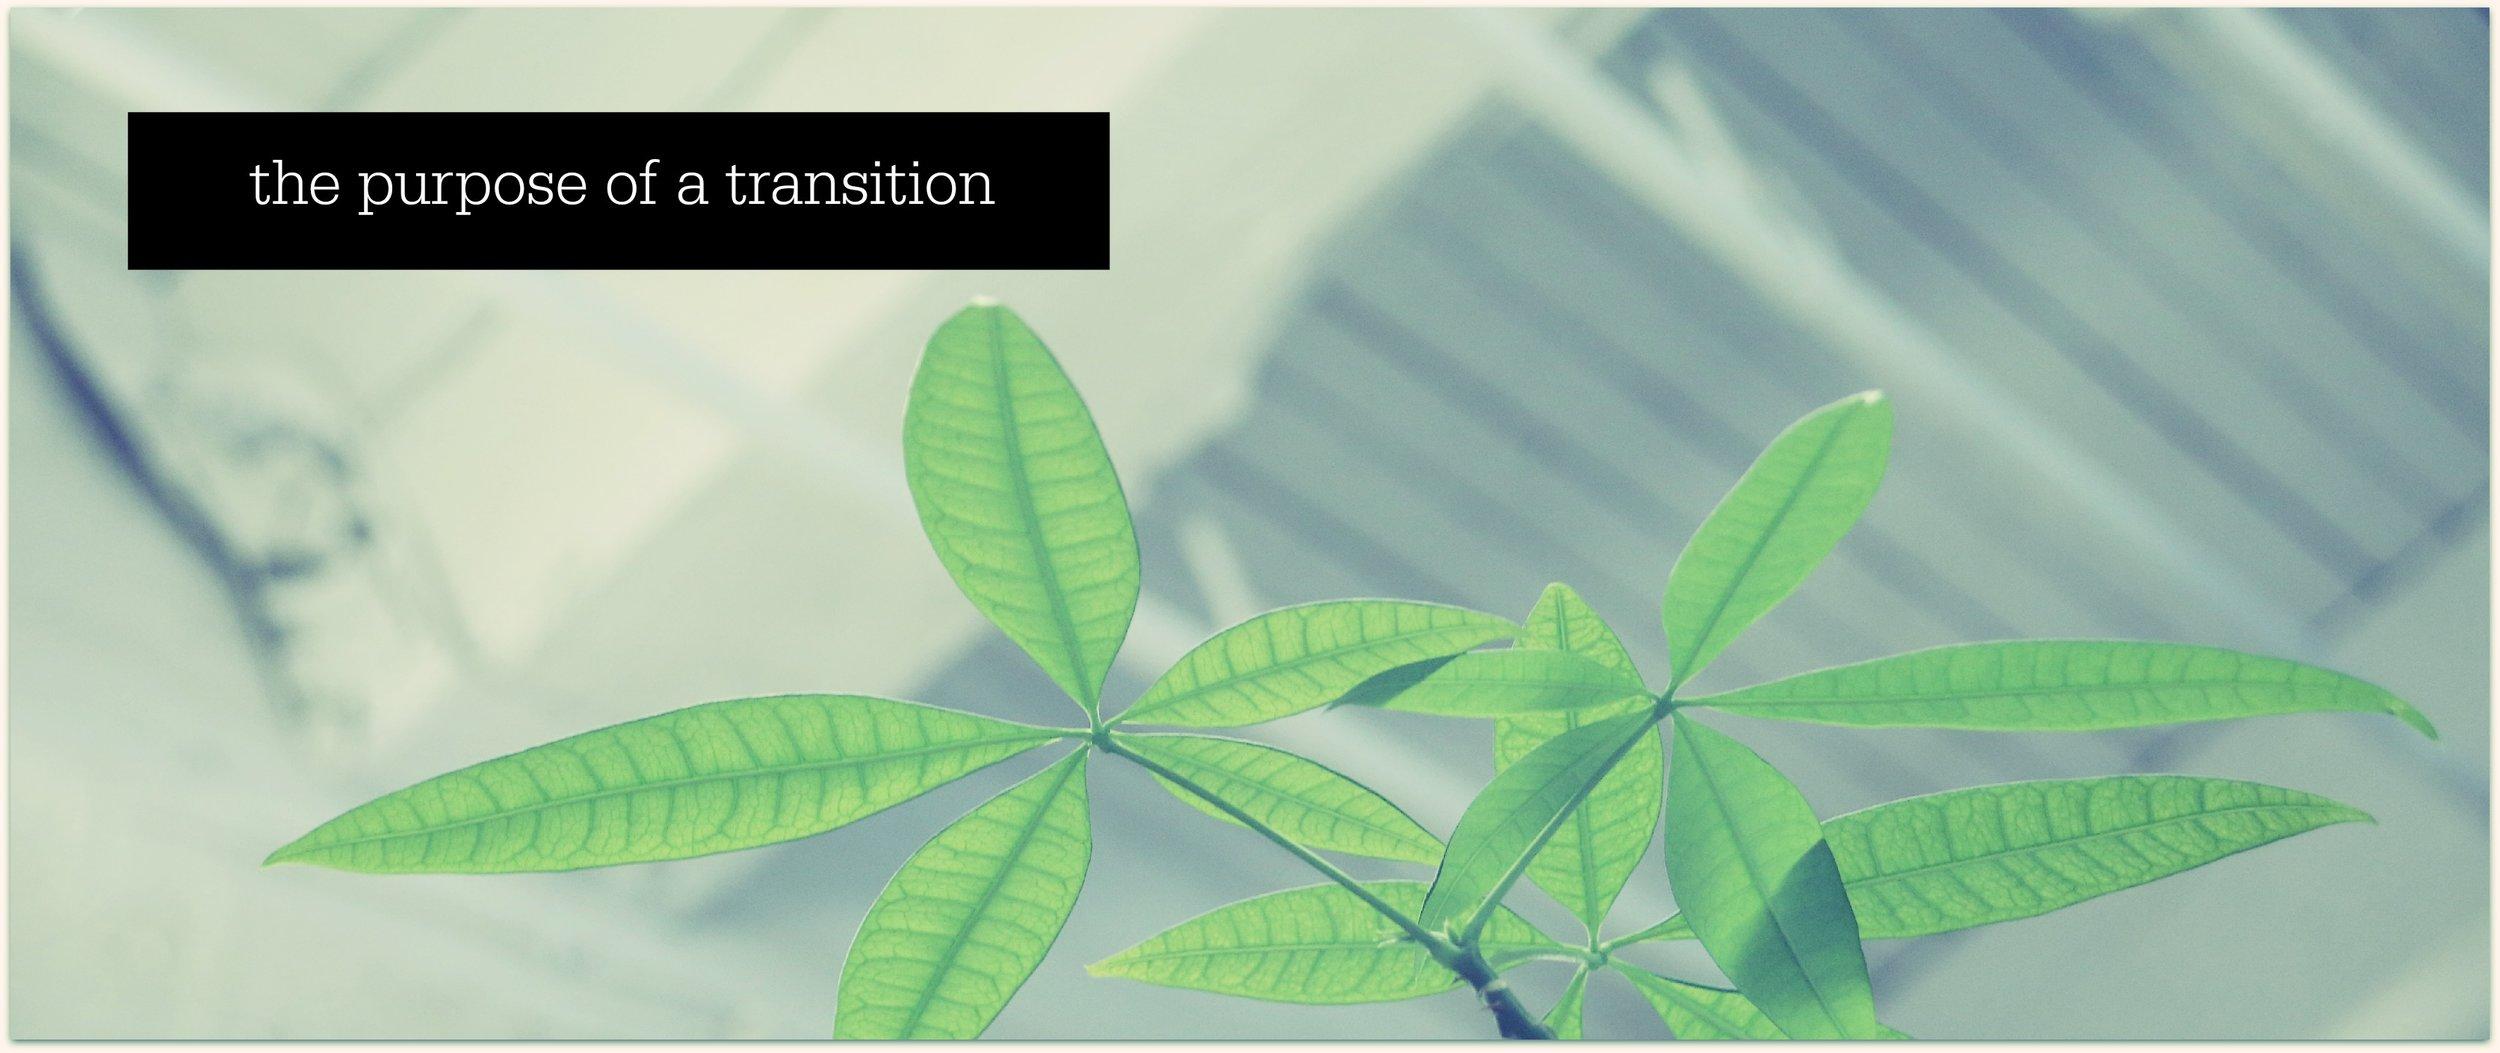 purpose of transition